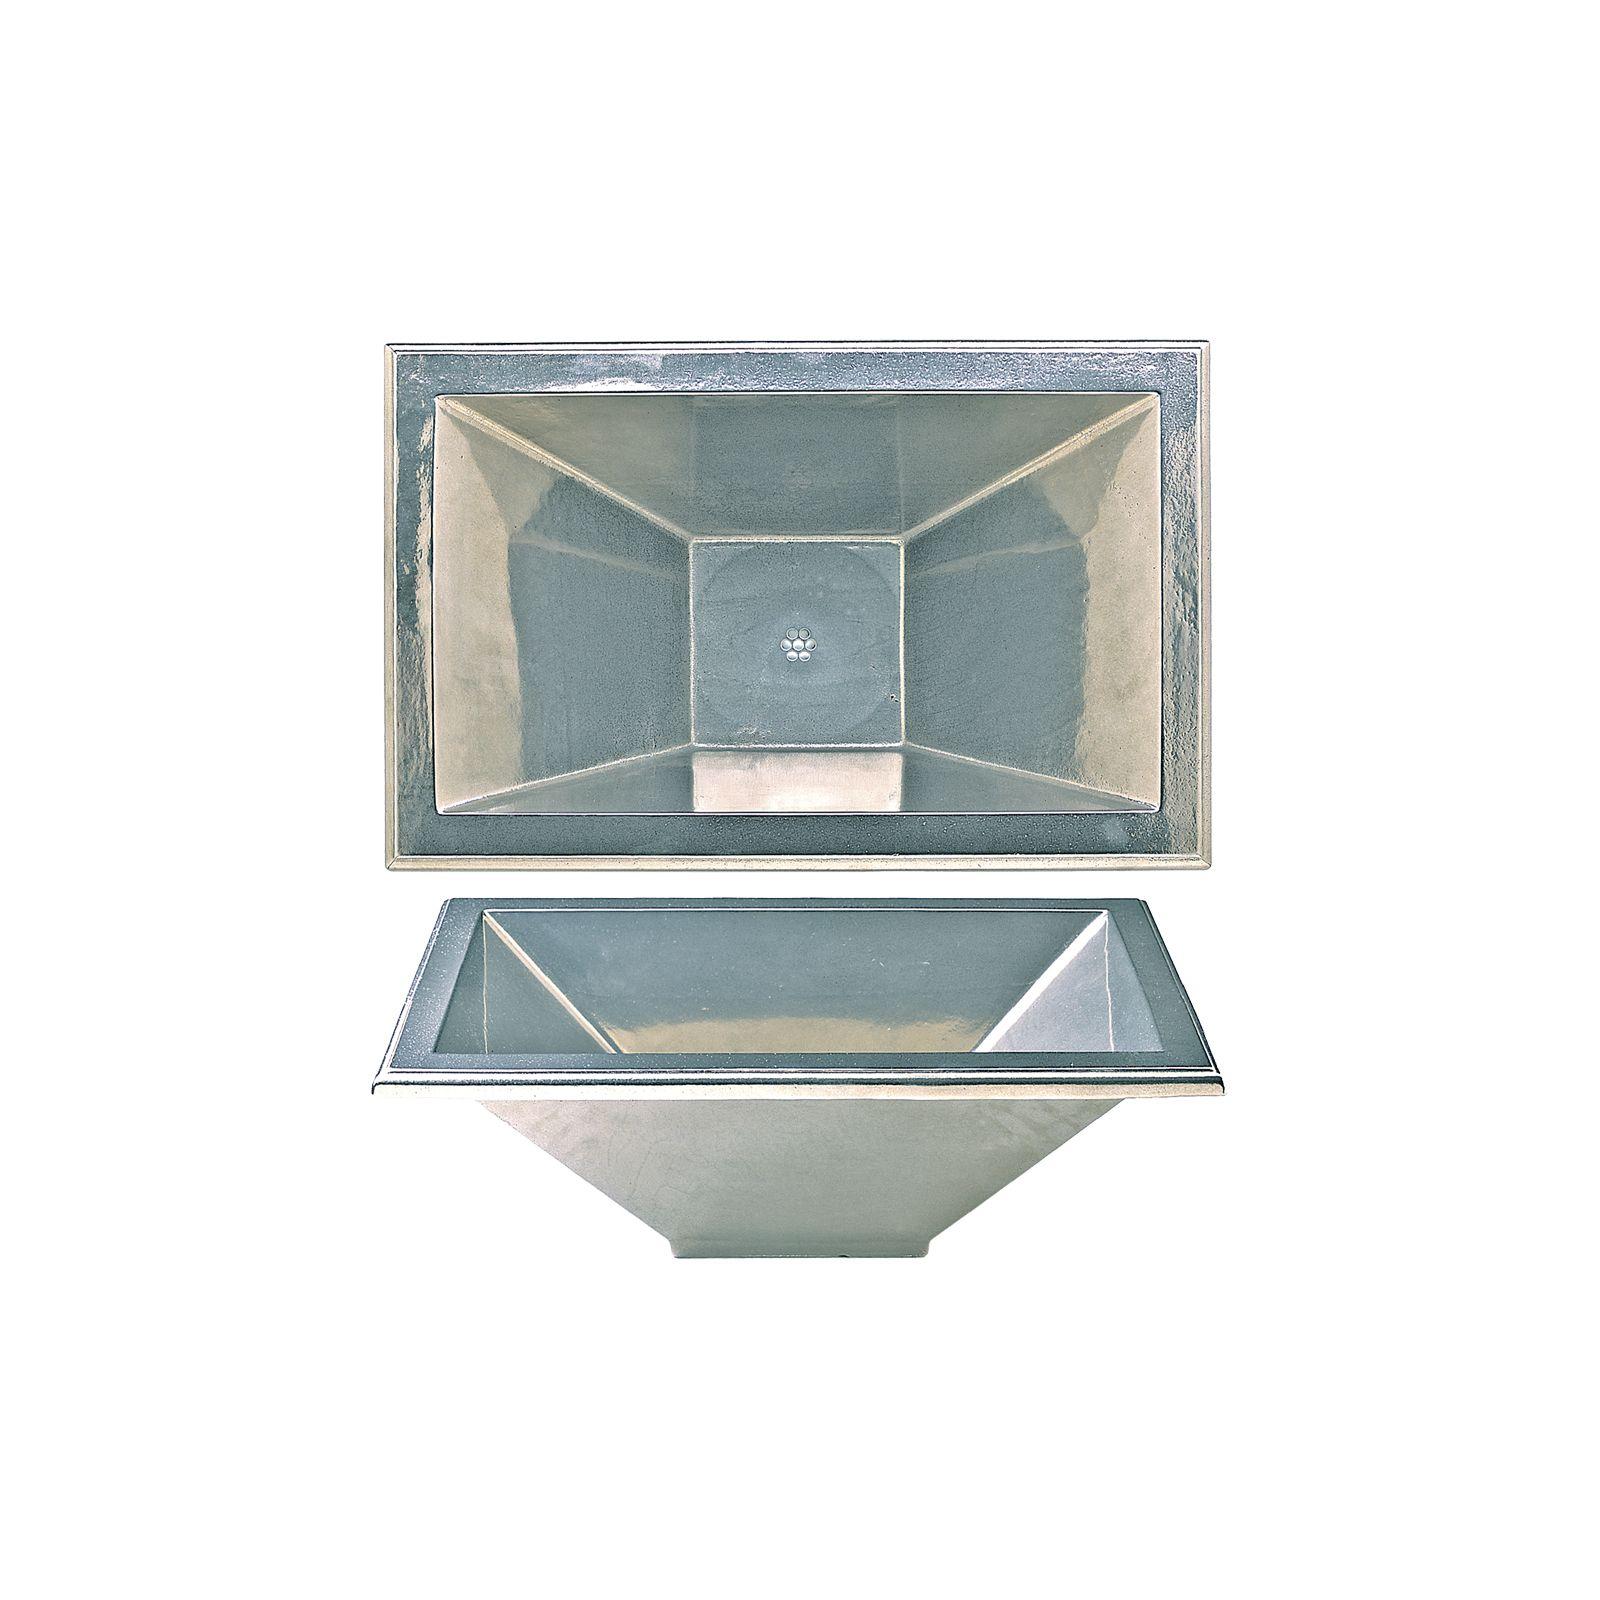 Beau Quadra Sink | Rocky Mountain Hardware